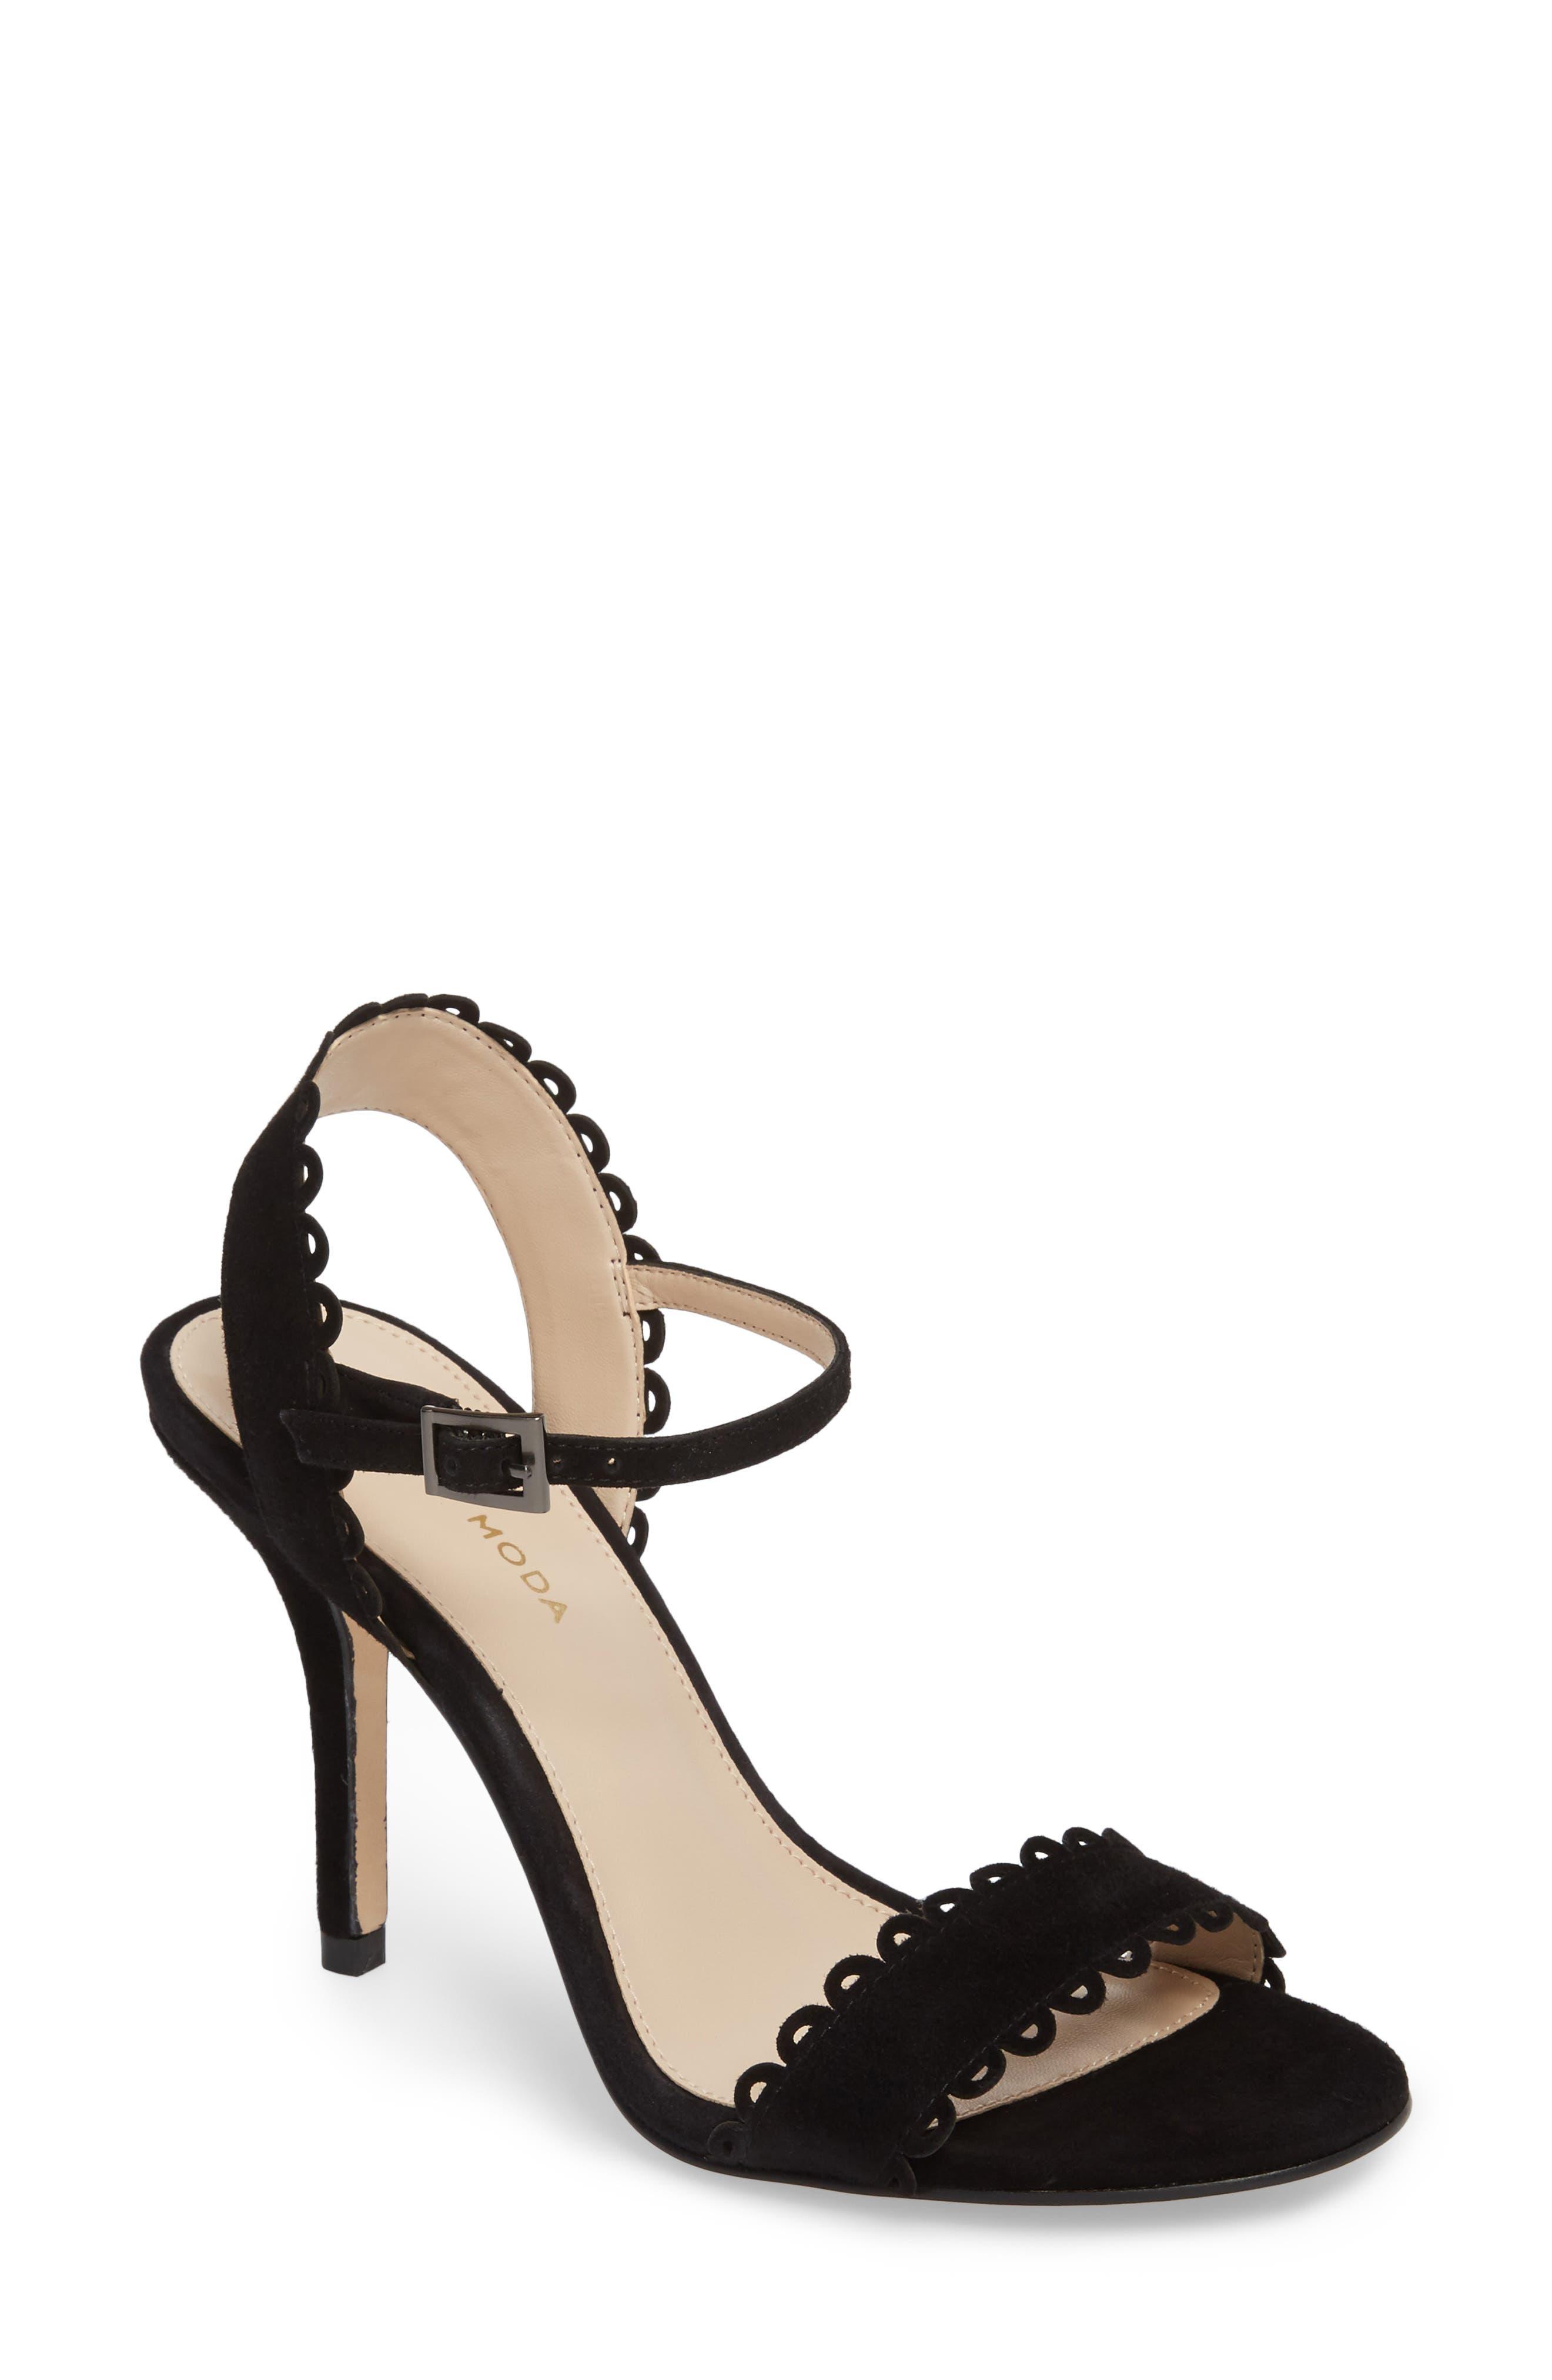 Karen Scallop Ankle Strap Sandal,                         Main,                         color,